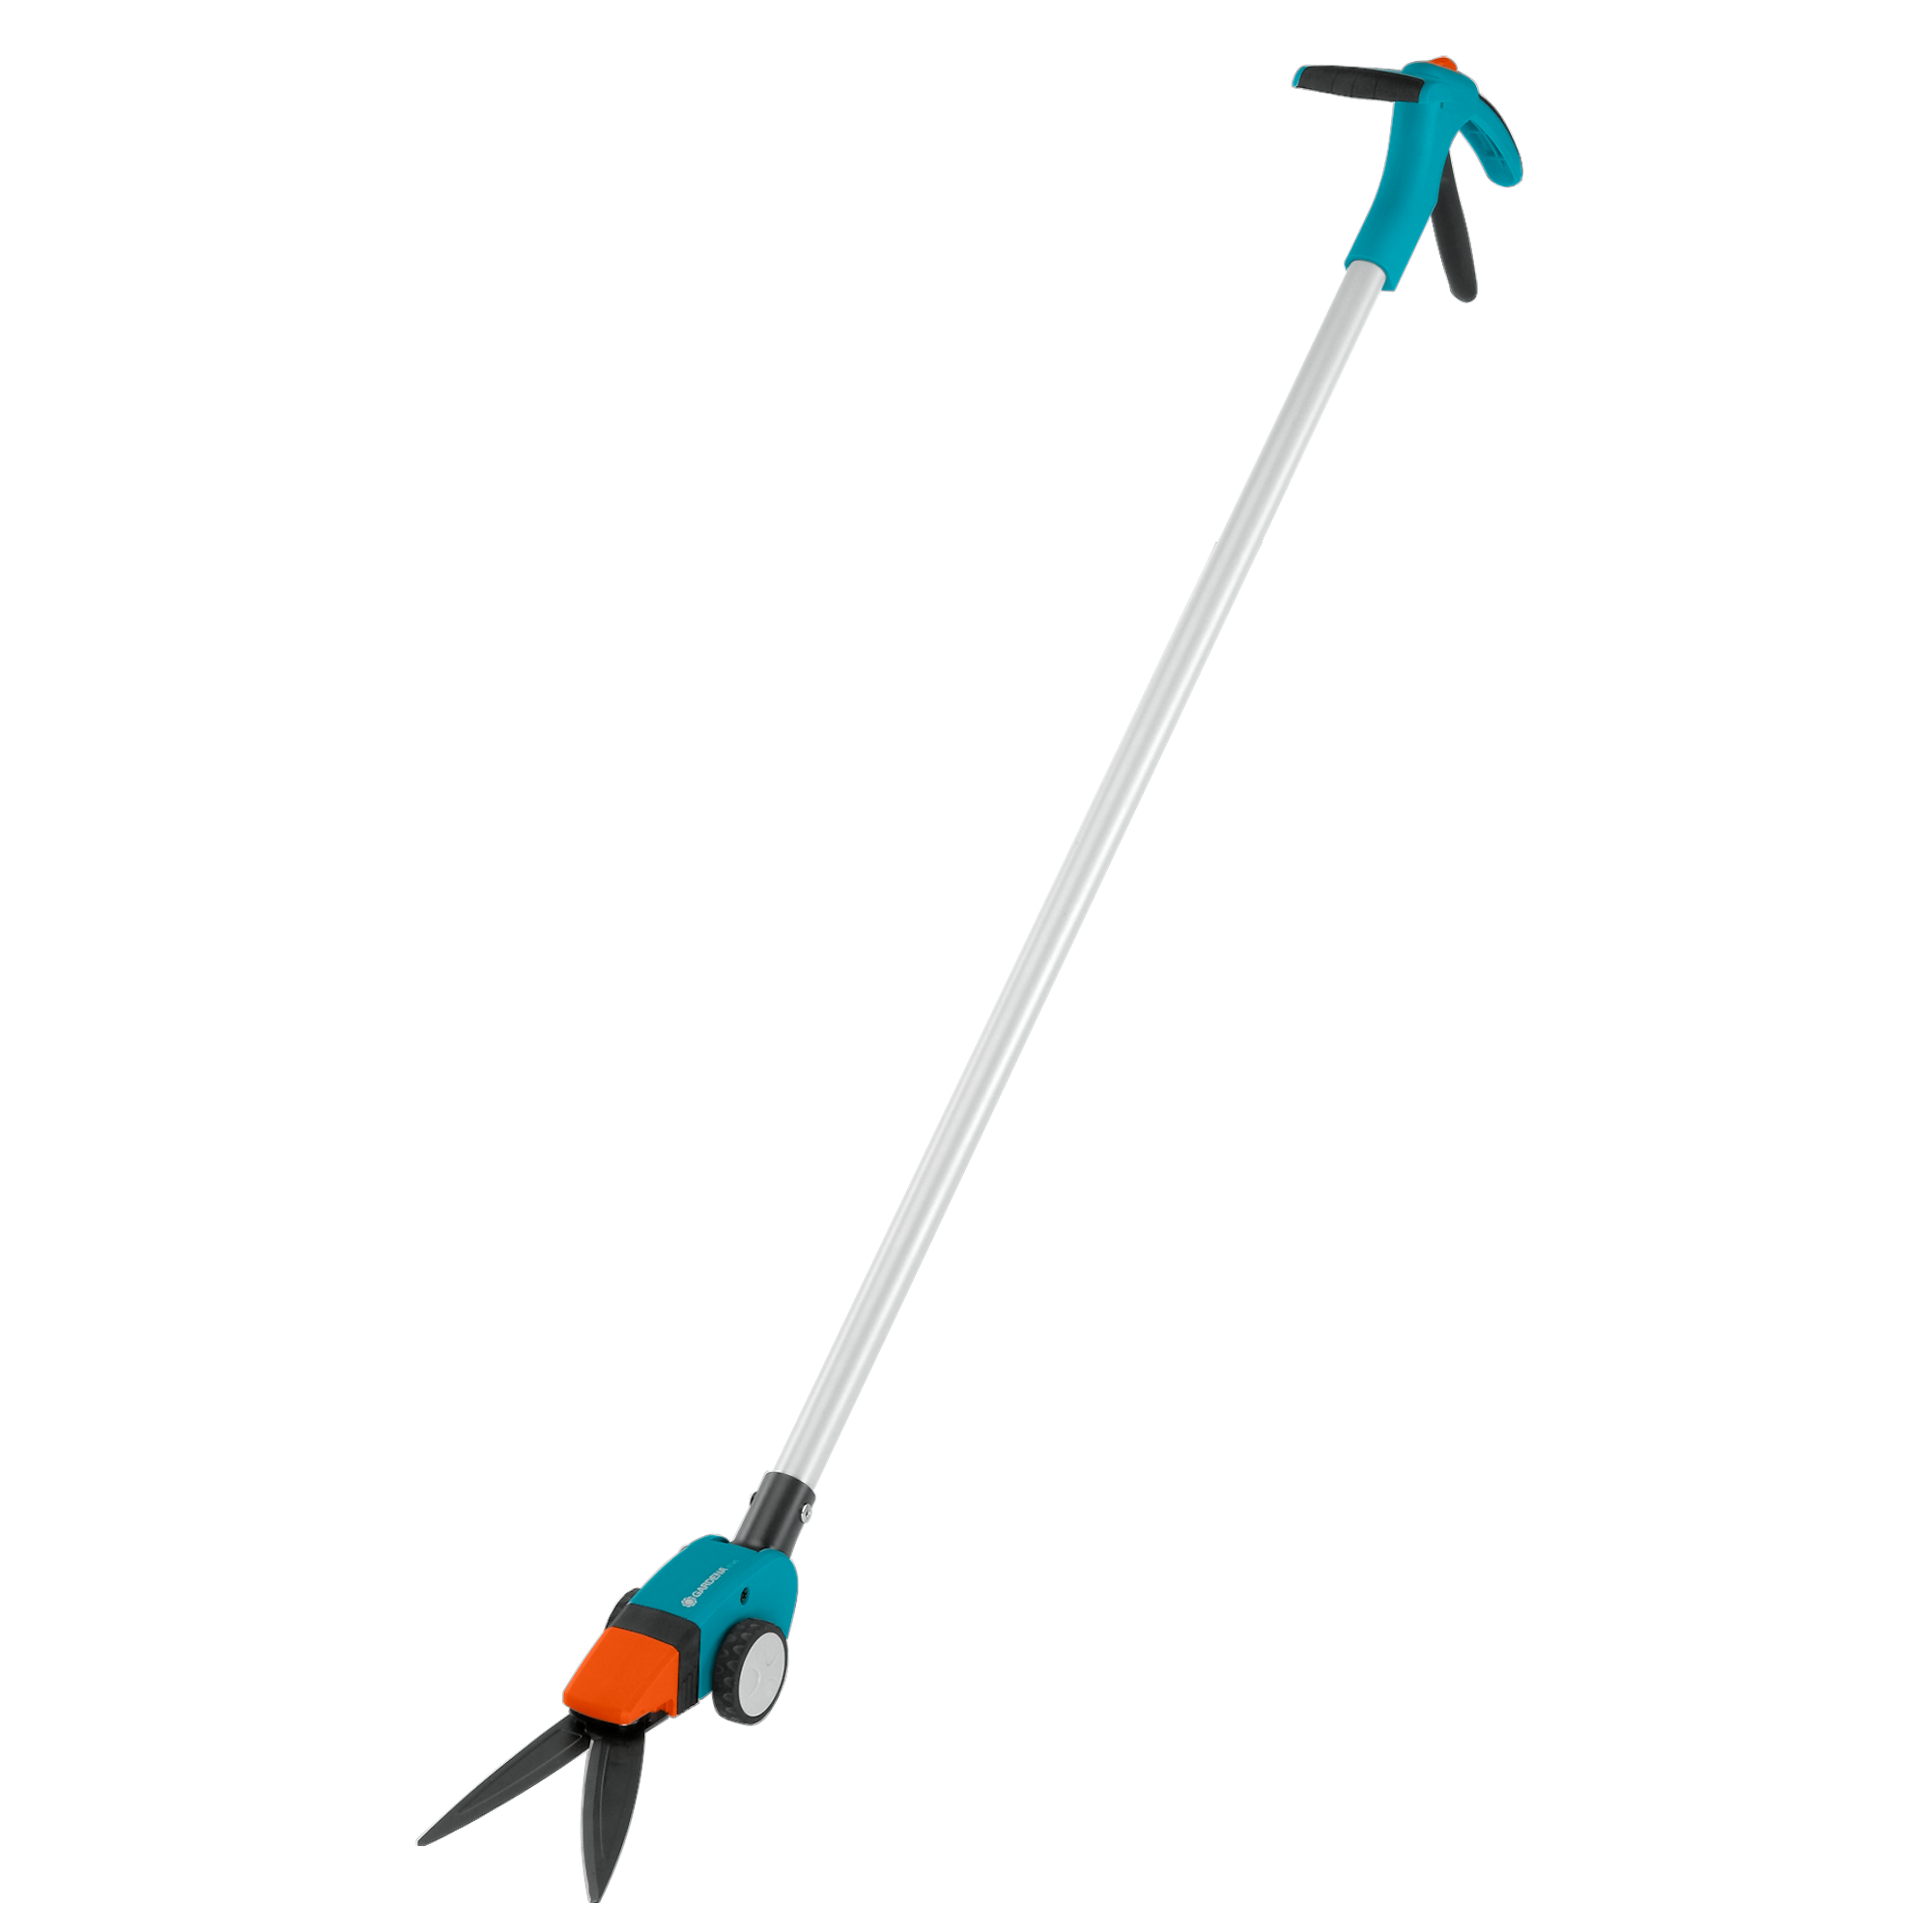 Gardena mechanical grass long. Shears clipart lawn tool